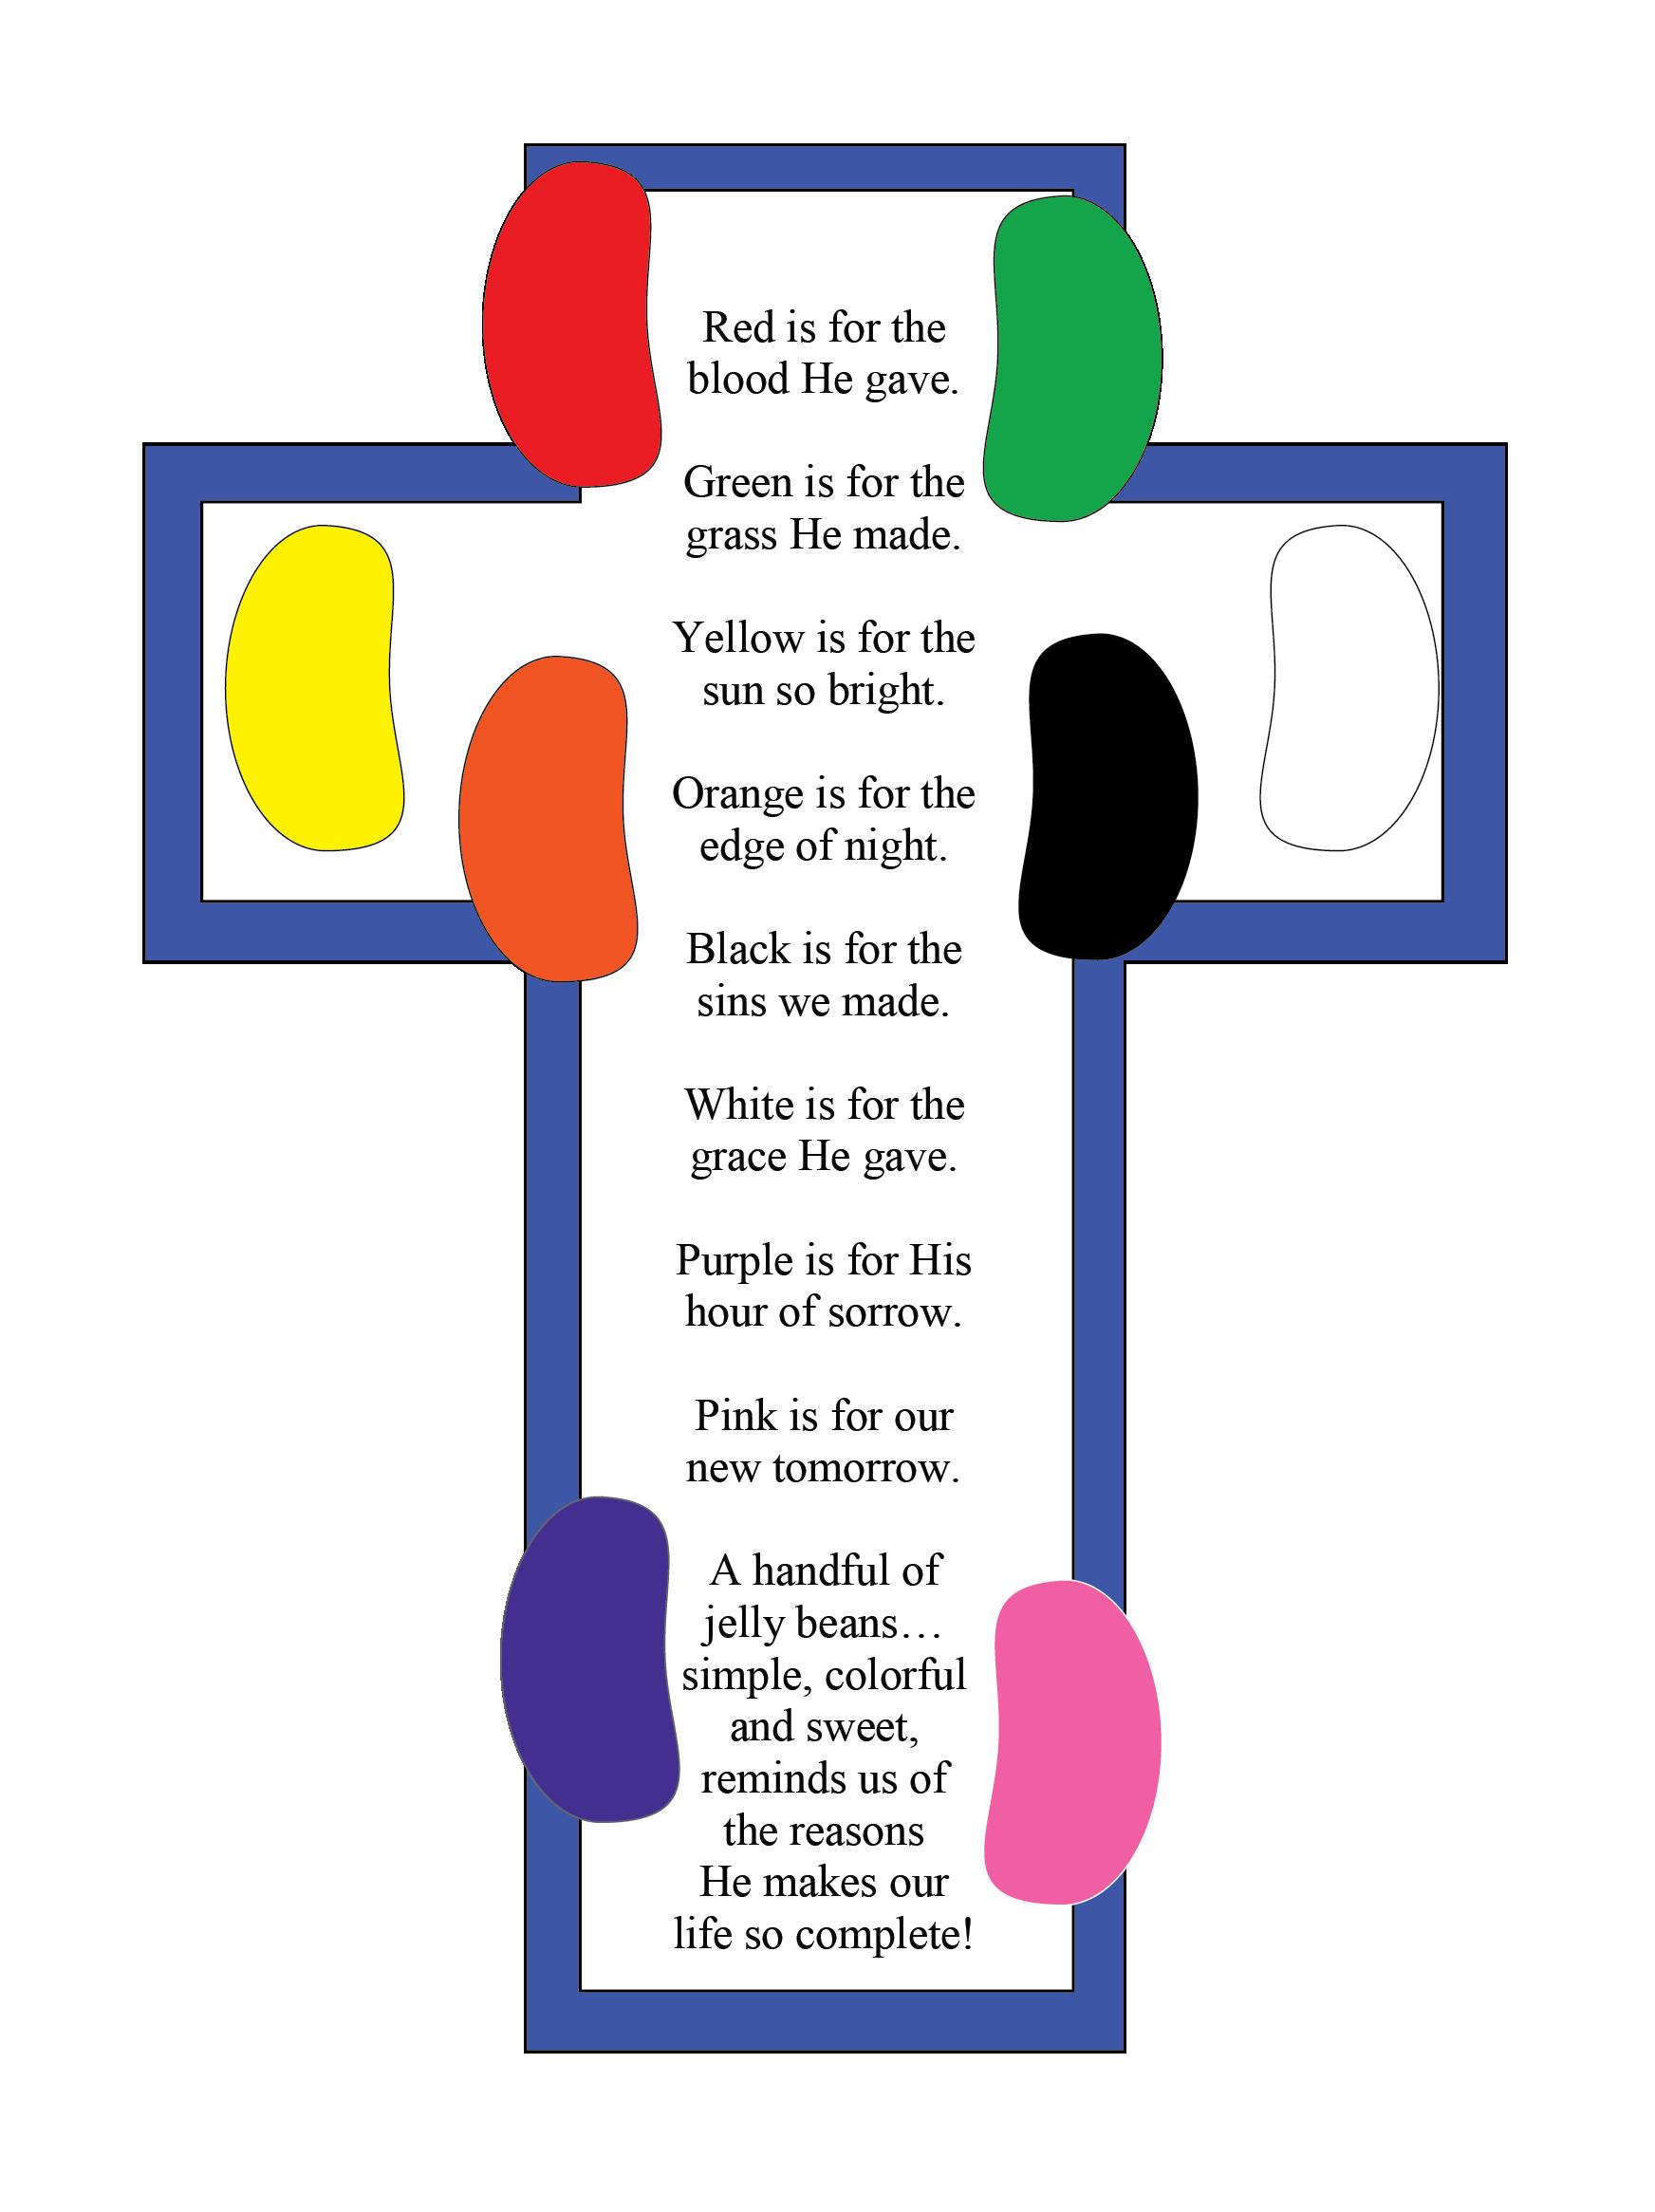 jelly-bean-prayer